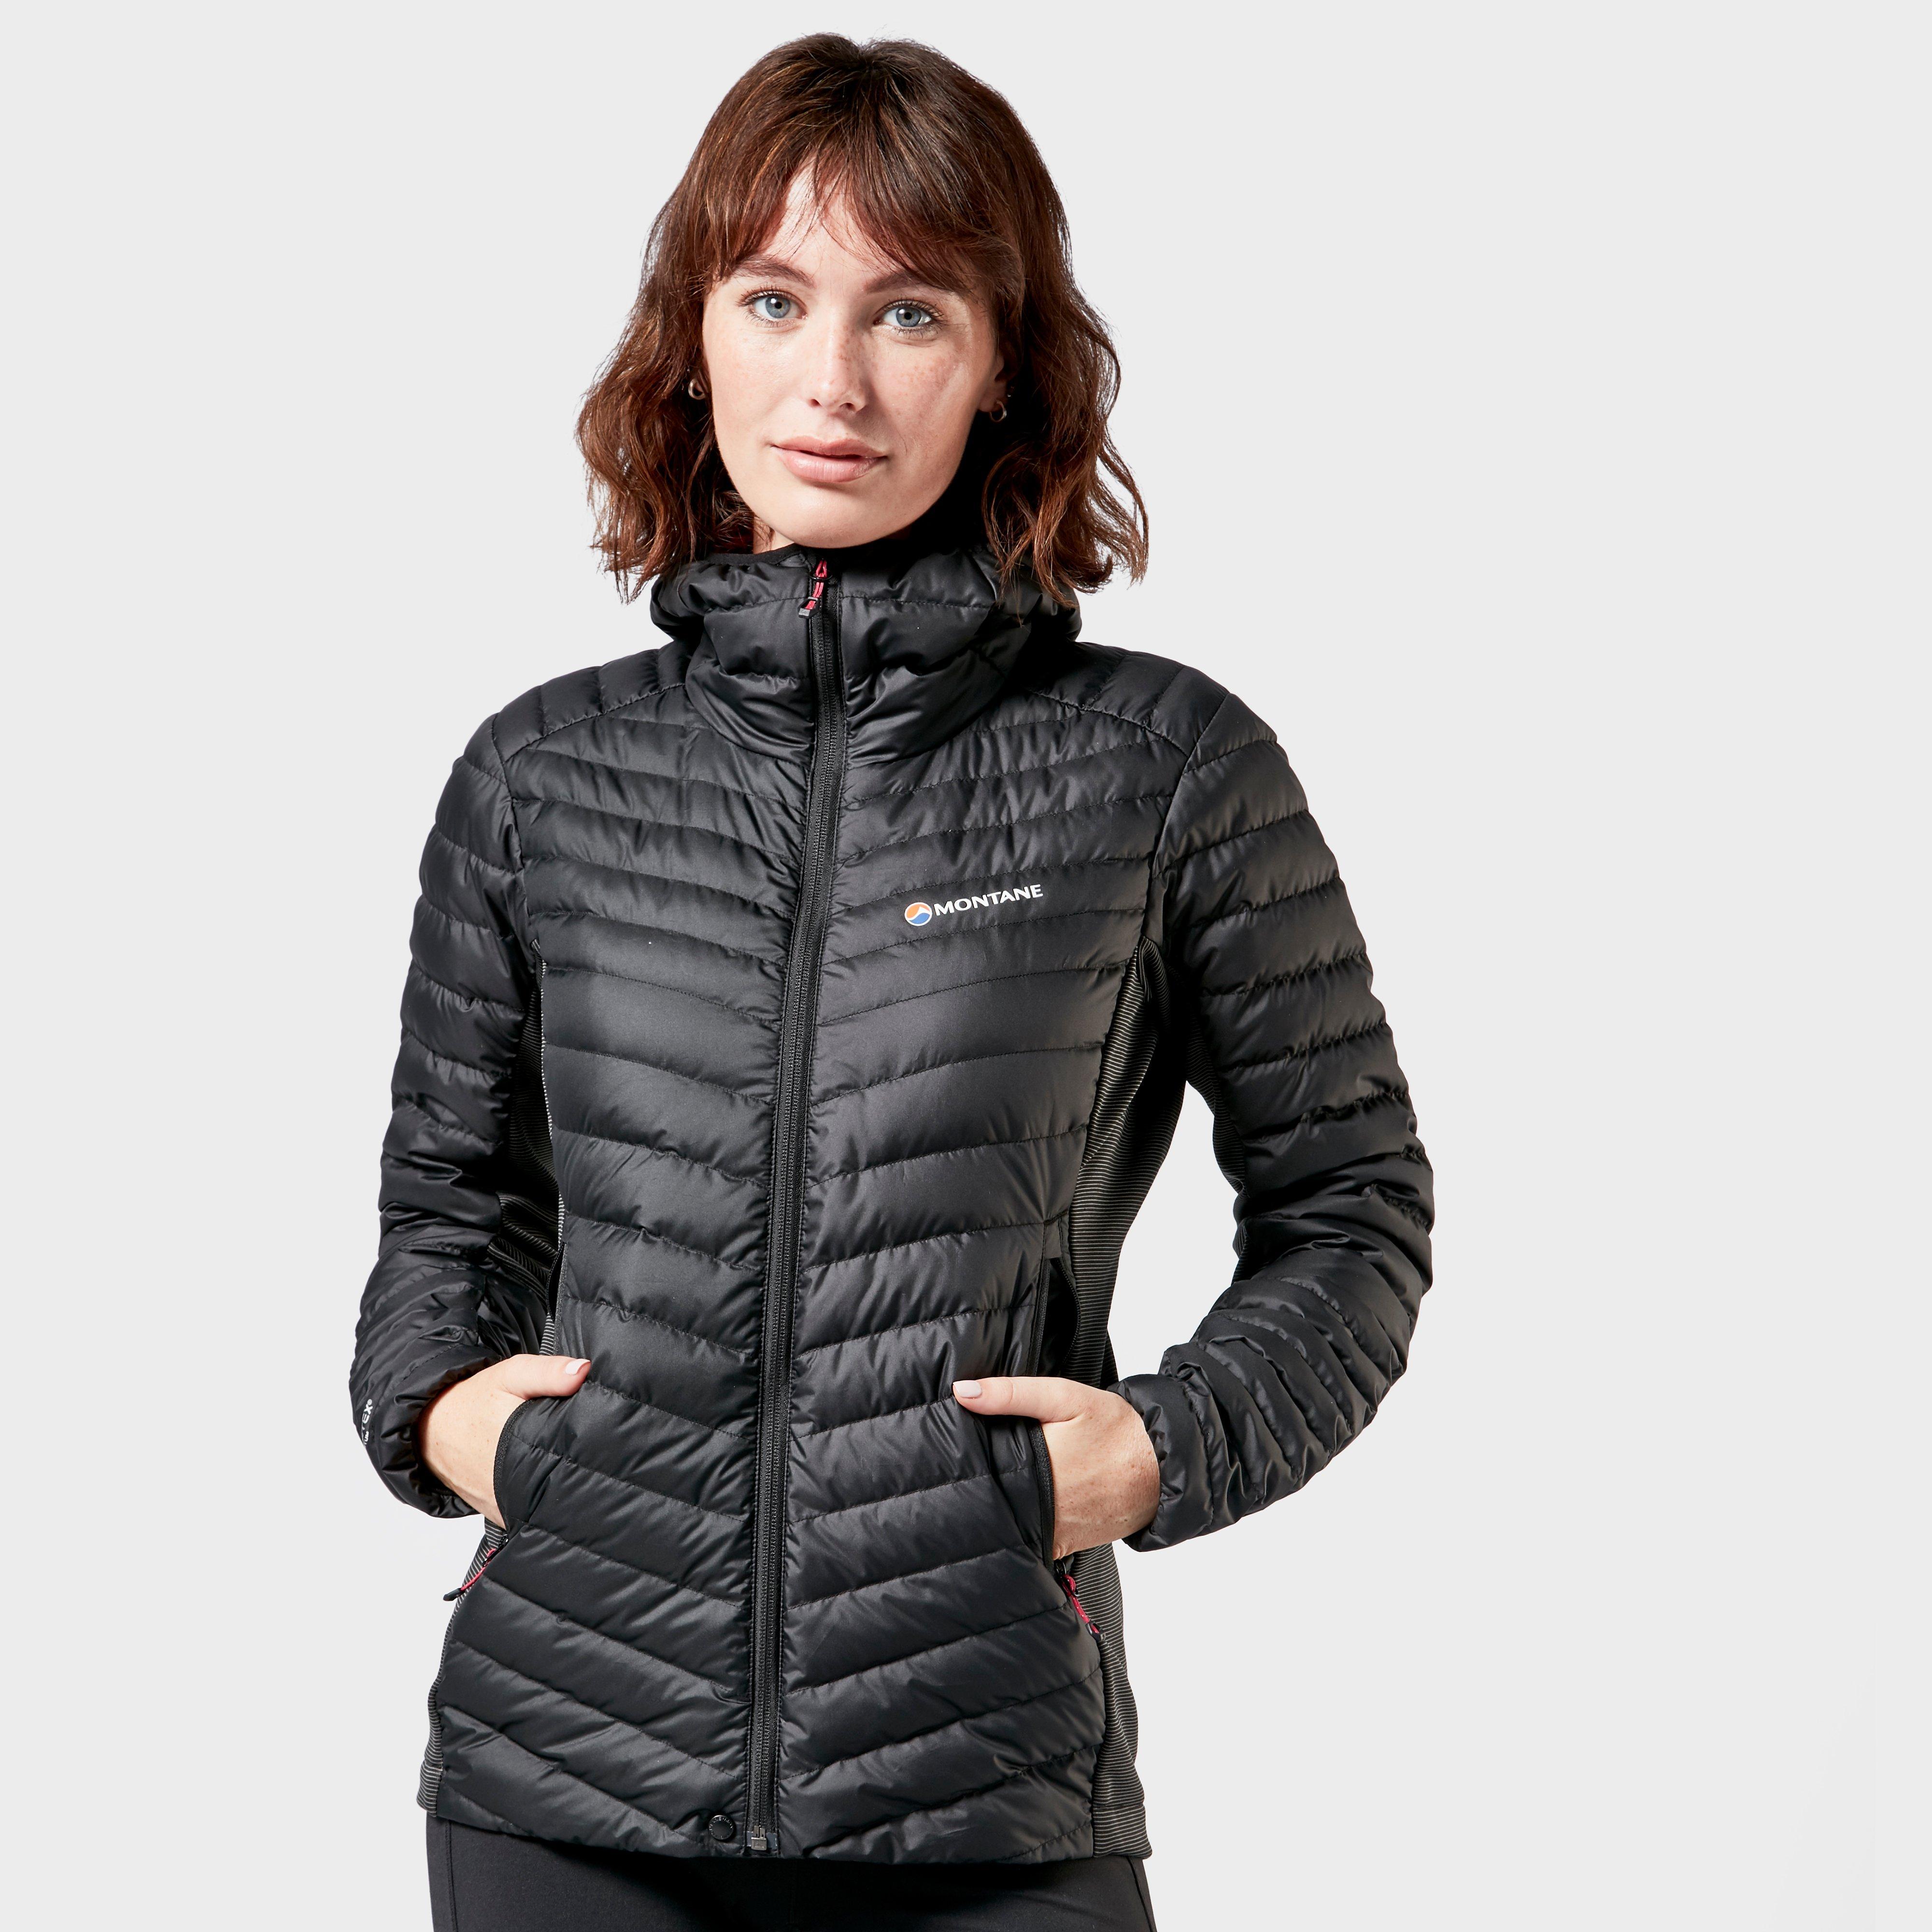 Montane Women's Crest Hybrid Jacket, Black